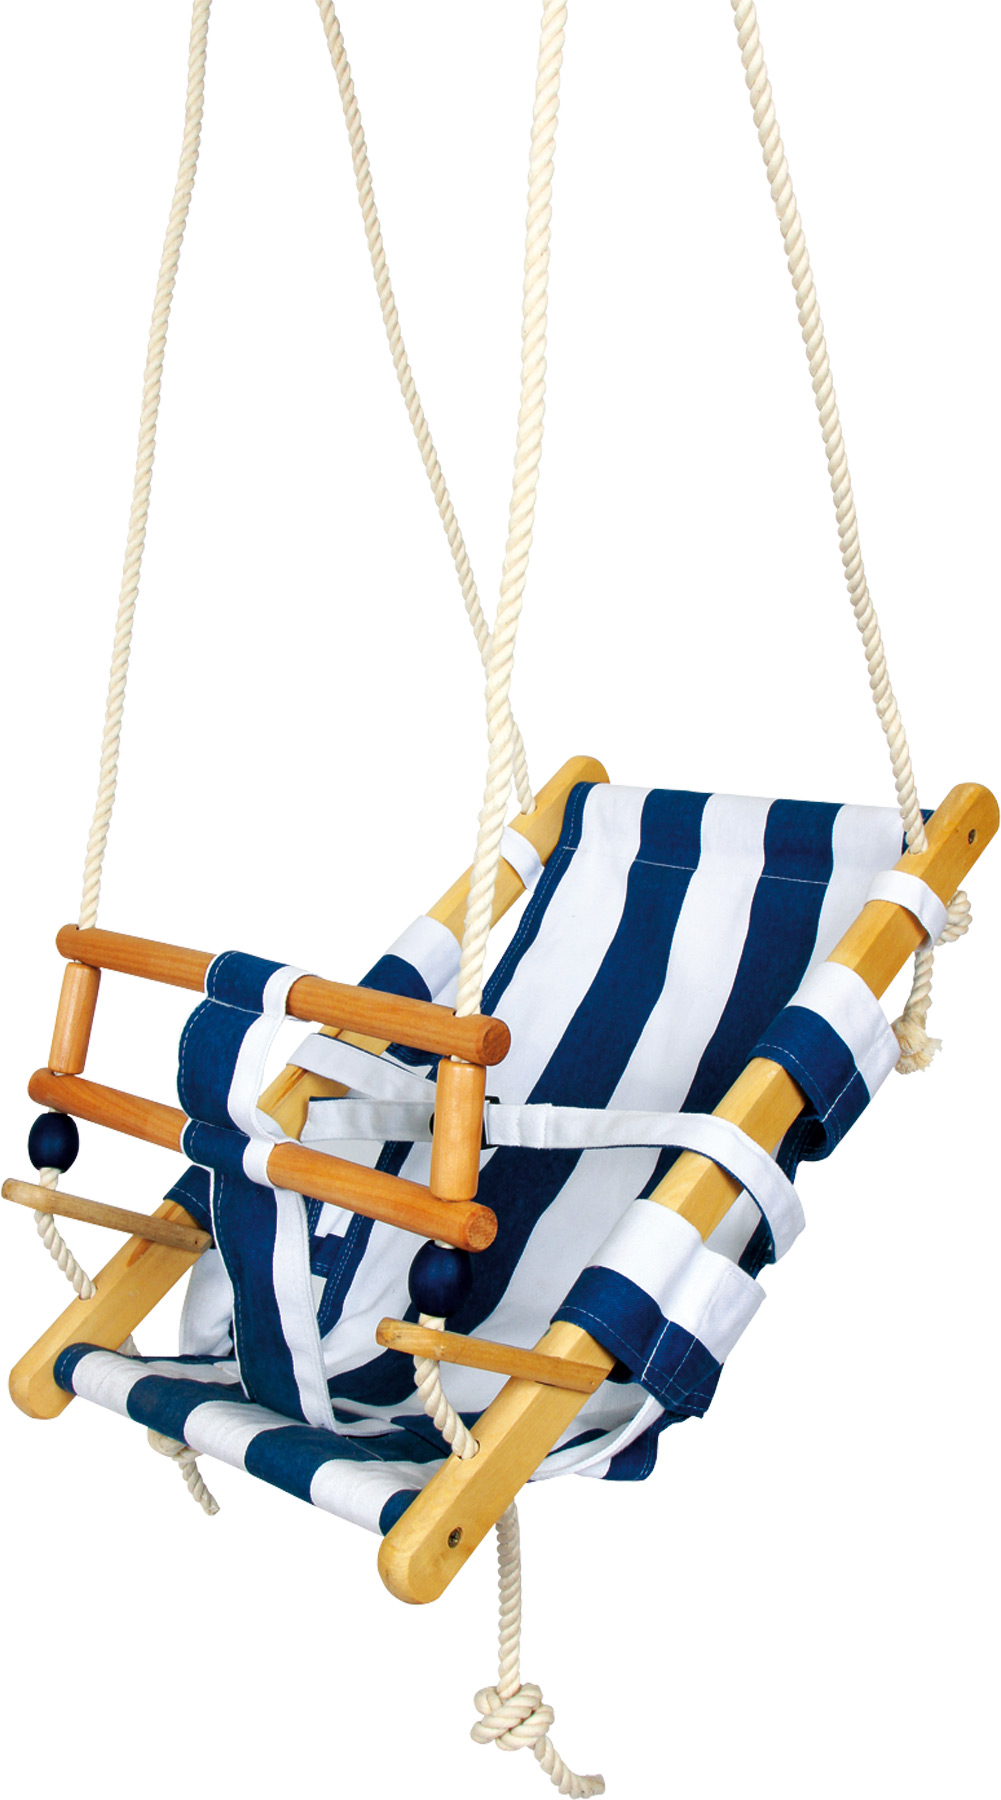 Small Foot Maritim Baby Gynge Haveudstyr Onlinekidsdk